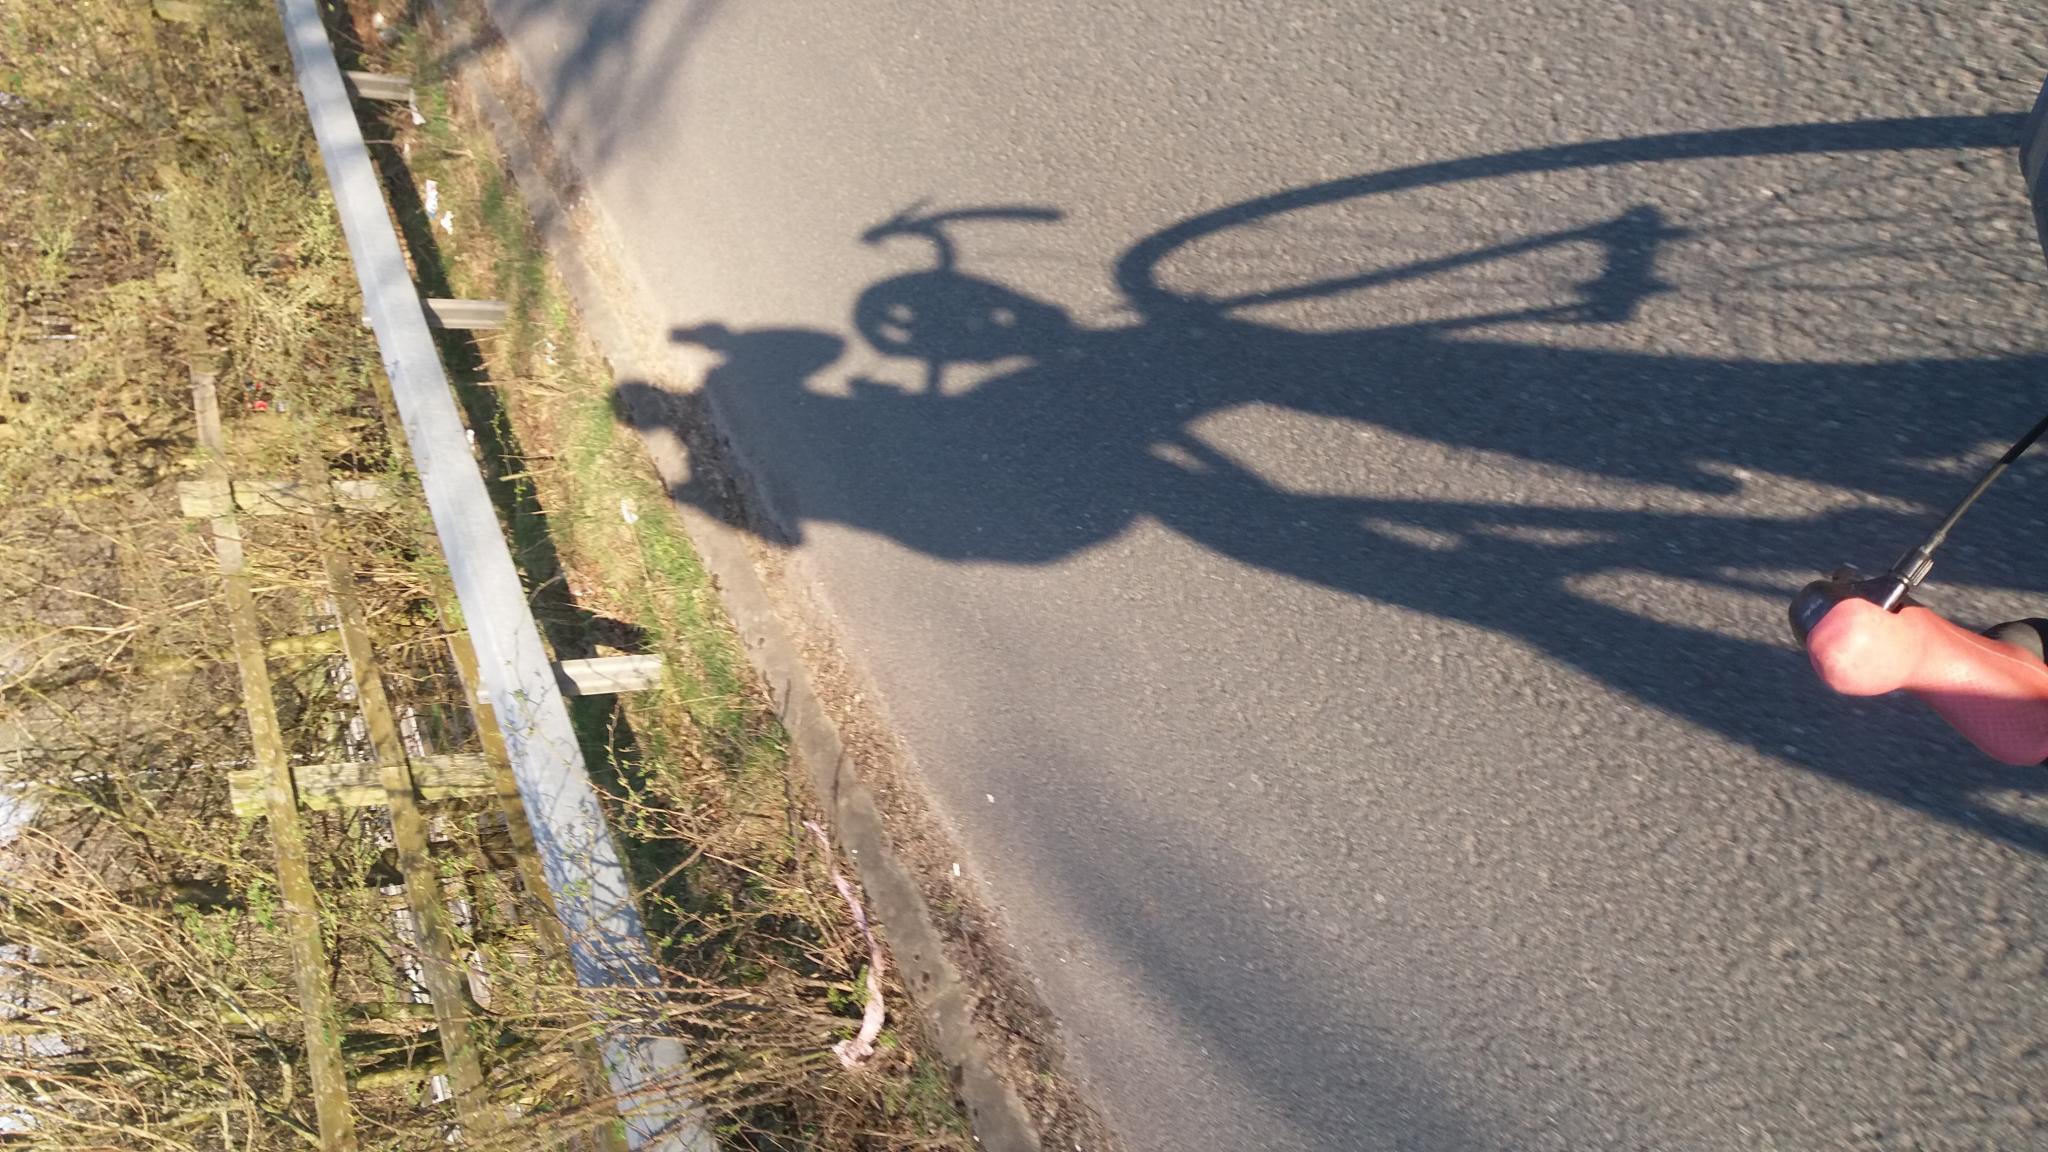 On my bike-20200327_163437-jpg